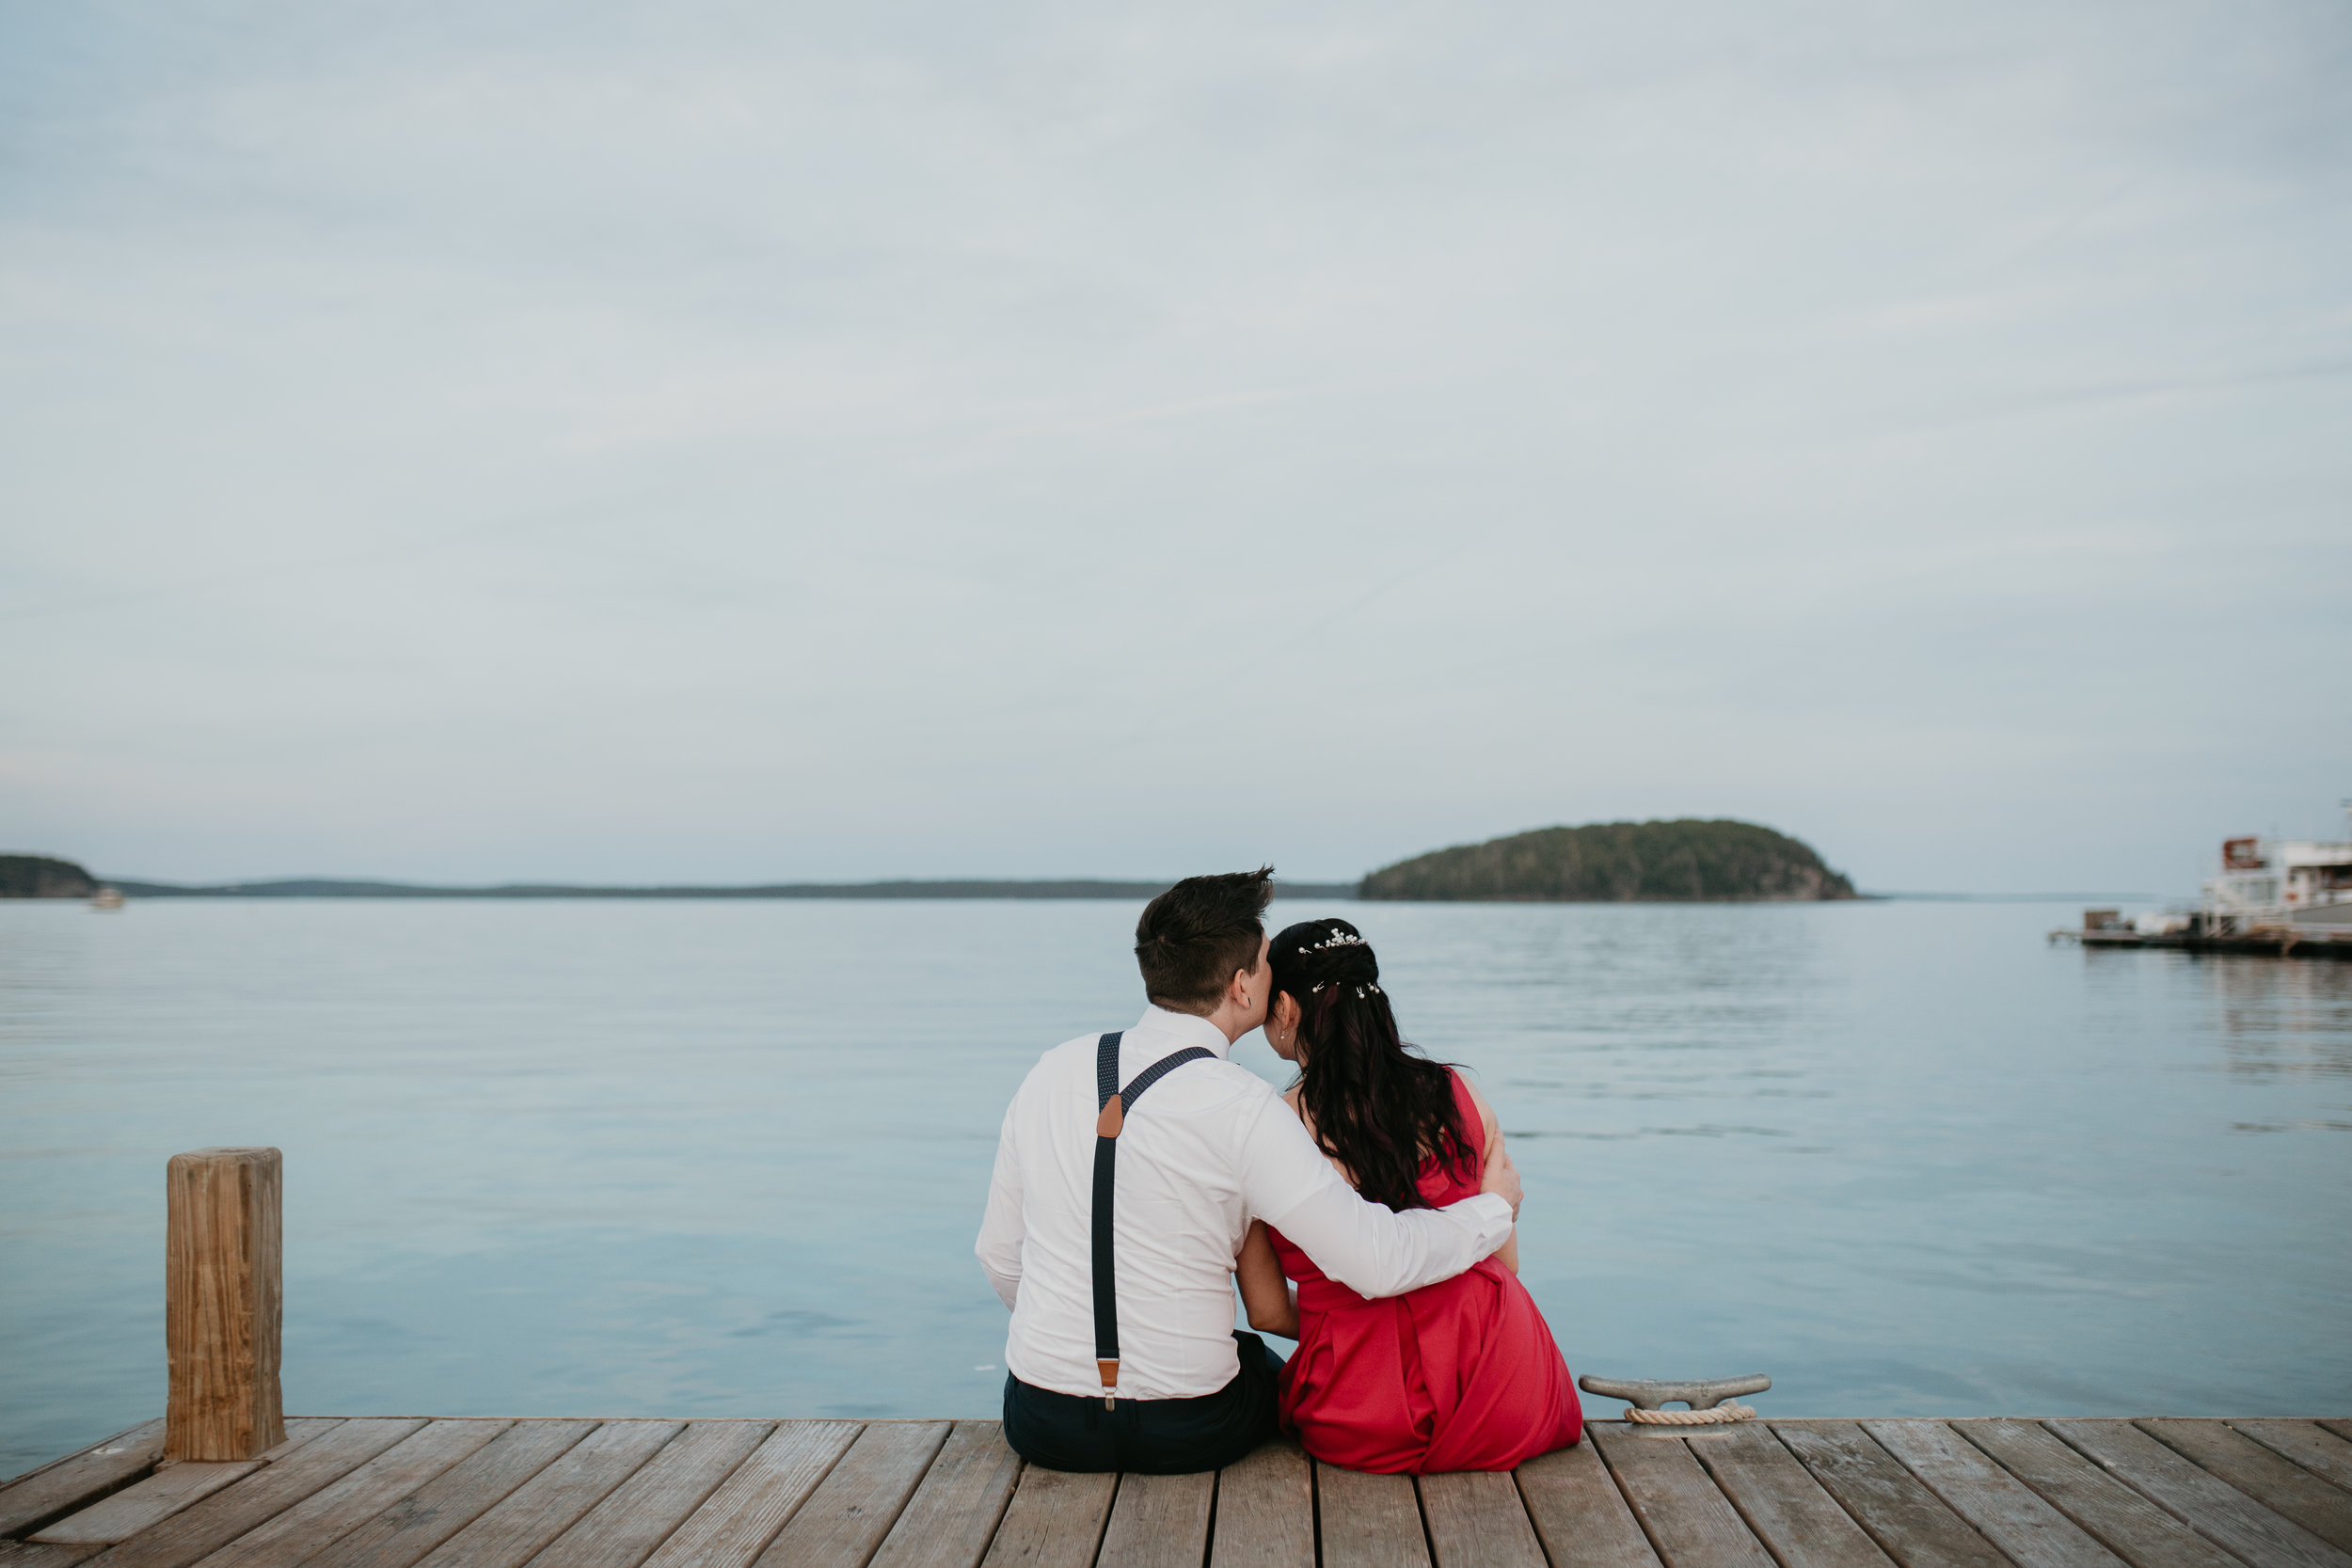 nicole-daacke-photography-Elopement-rocky-shoreline-coast-Acadia-National-Park-elopement-photographer-inspiration-maine-elopement-otter-cliffs-schoonic-head-point-55.jpg